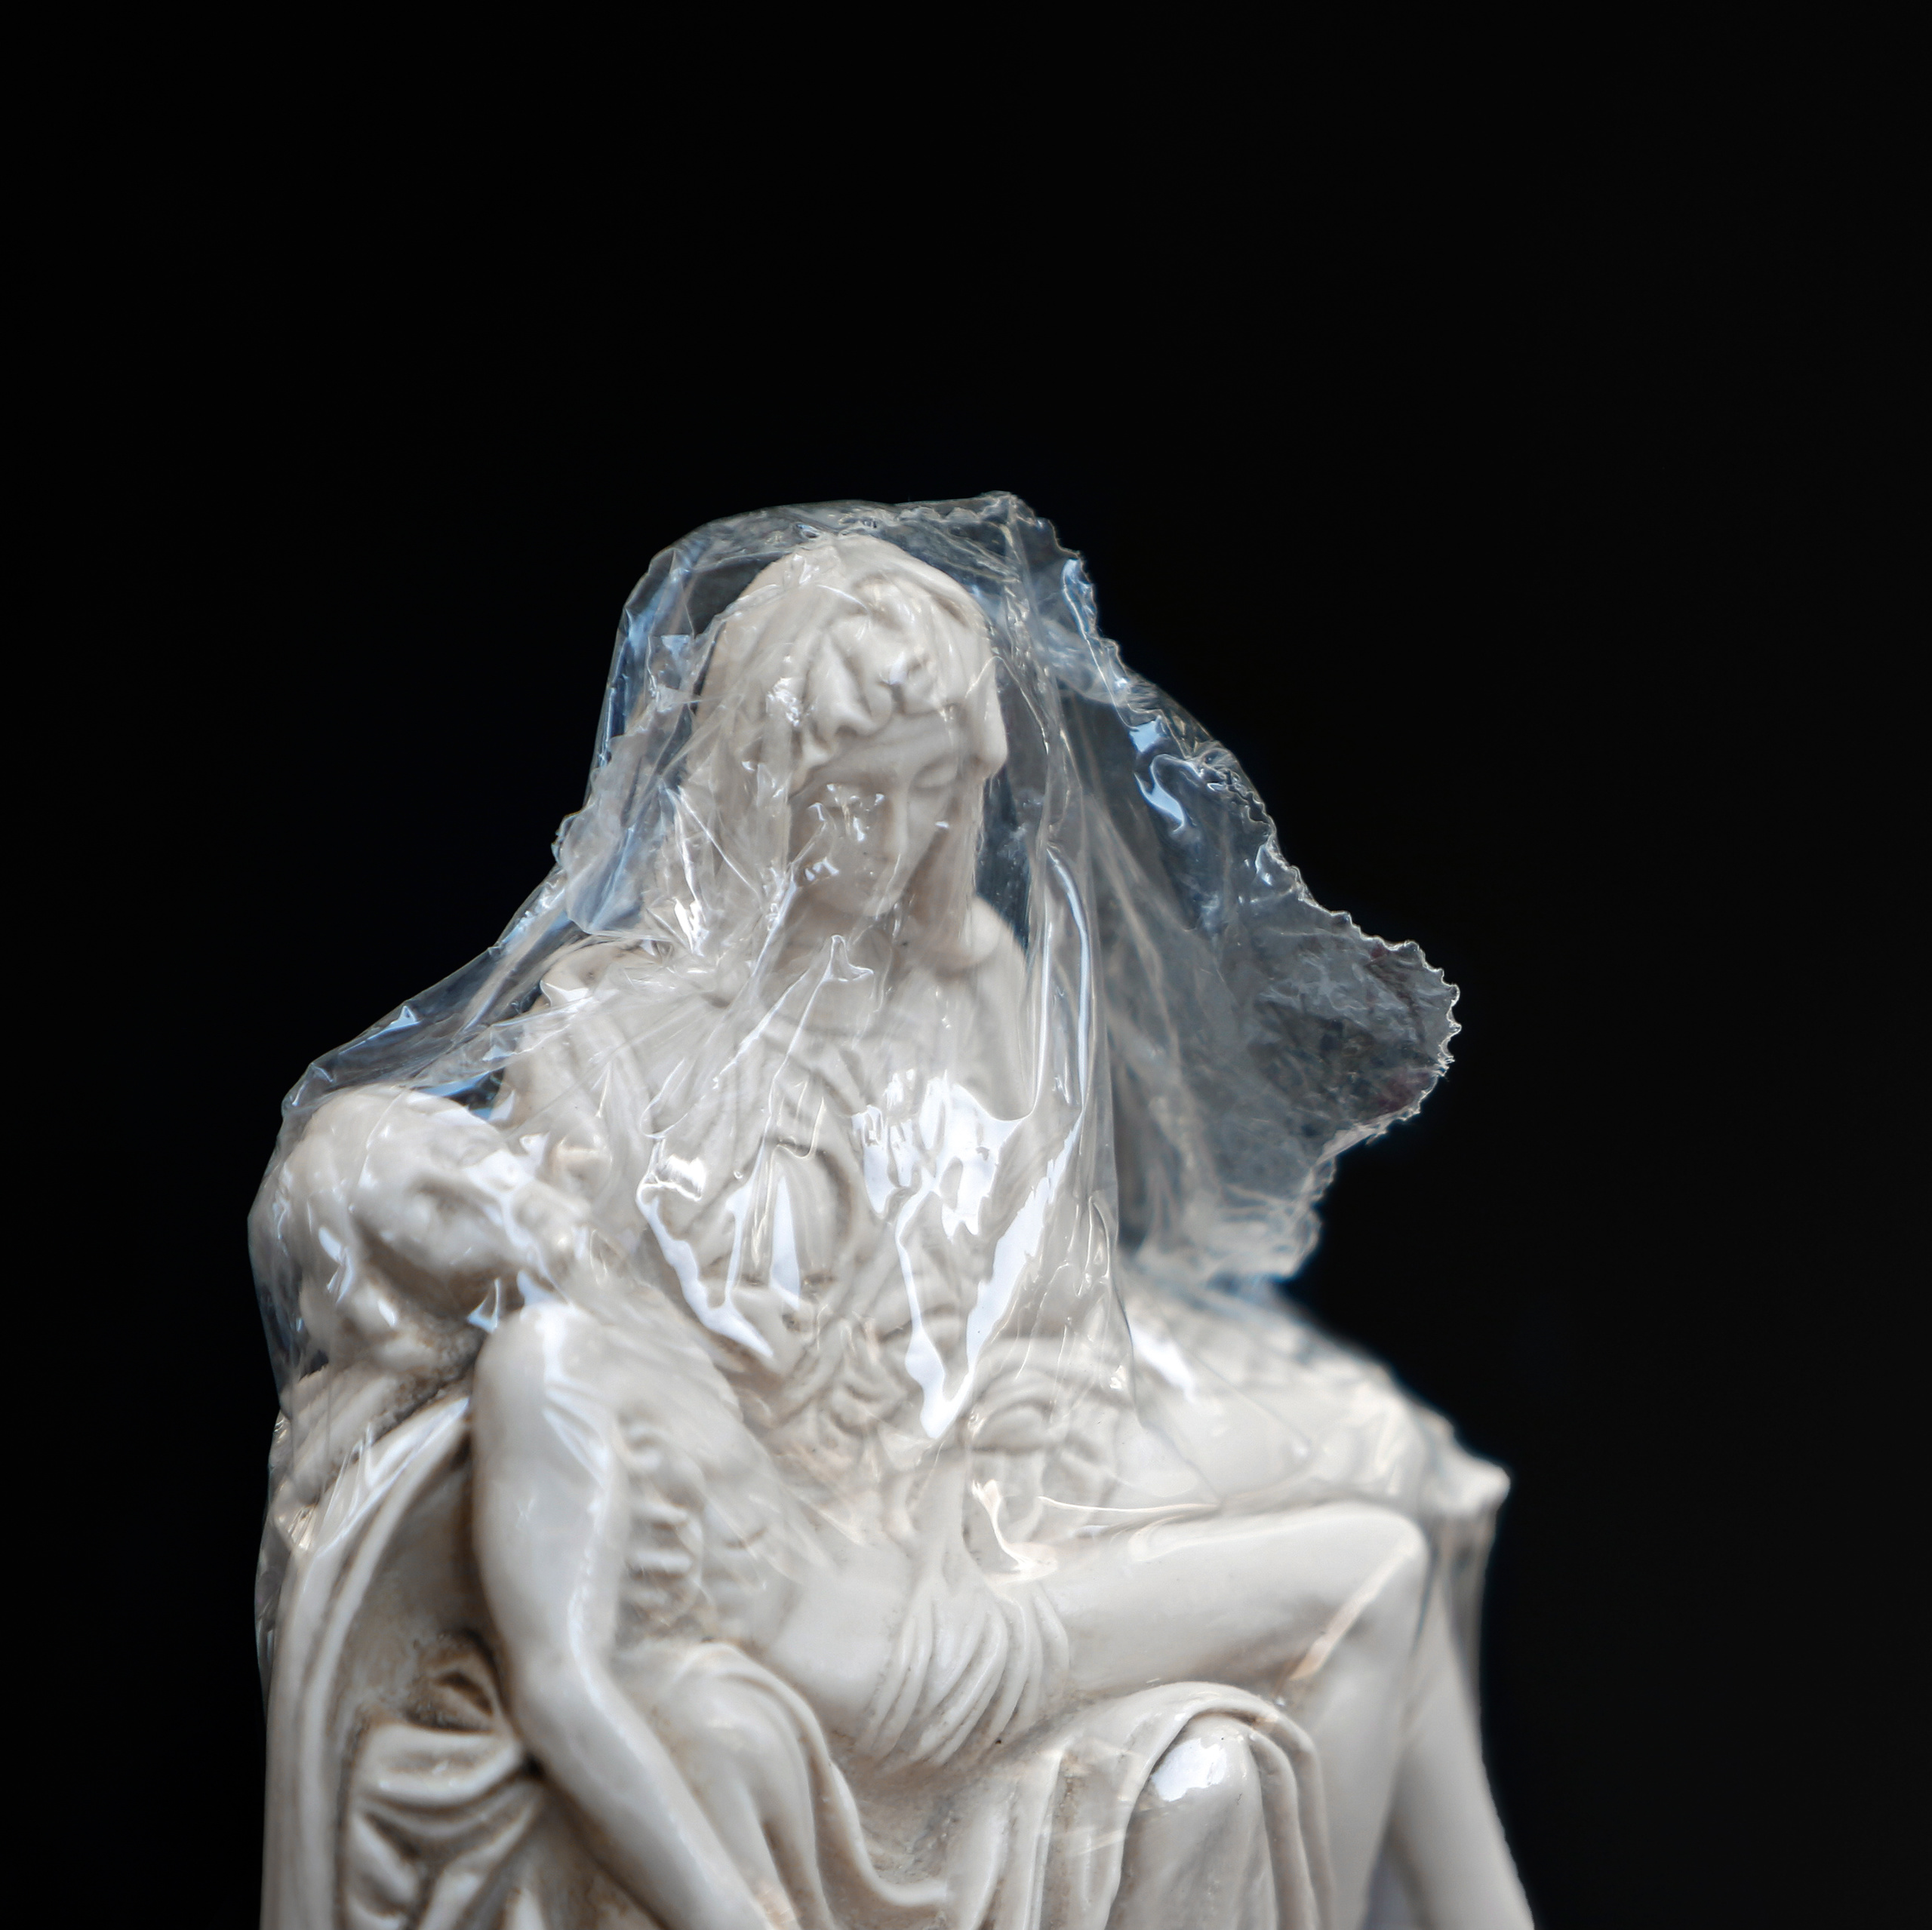 Parham Didehvar, Untitled, 2020